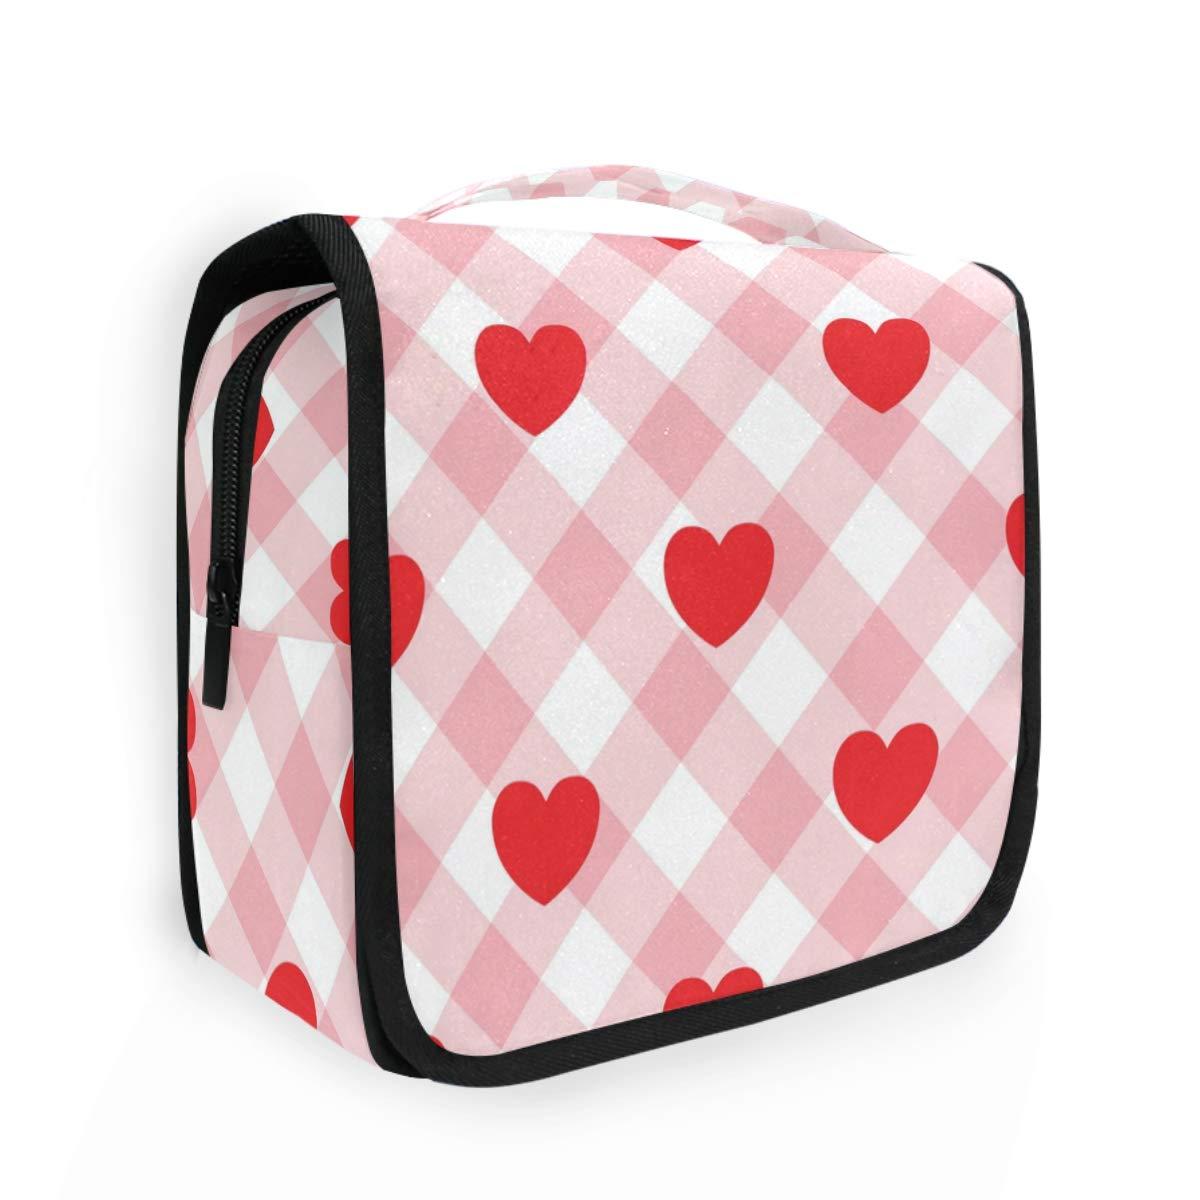 CaTaKu Happy Valentine Cosmetic Toiletry Bag, Love Tartan Cosmetic Bag Toiletry Bag Multifunction Bag Cosmetic Portable Makeup Waterproof Travel Hanging Organizer Bag for Men & Women